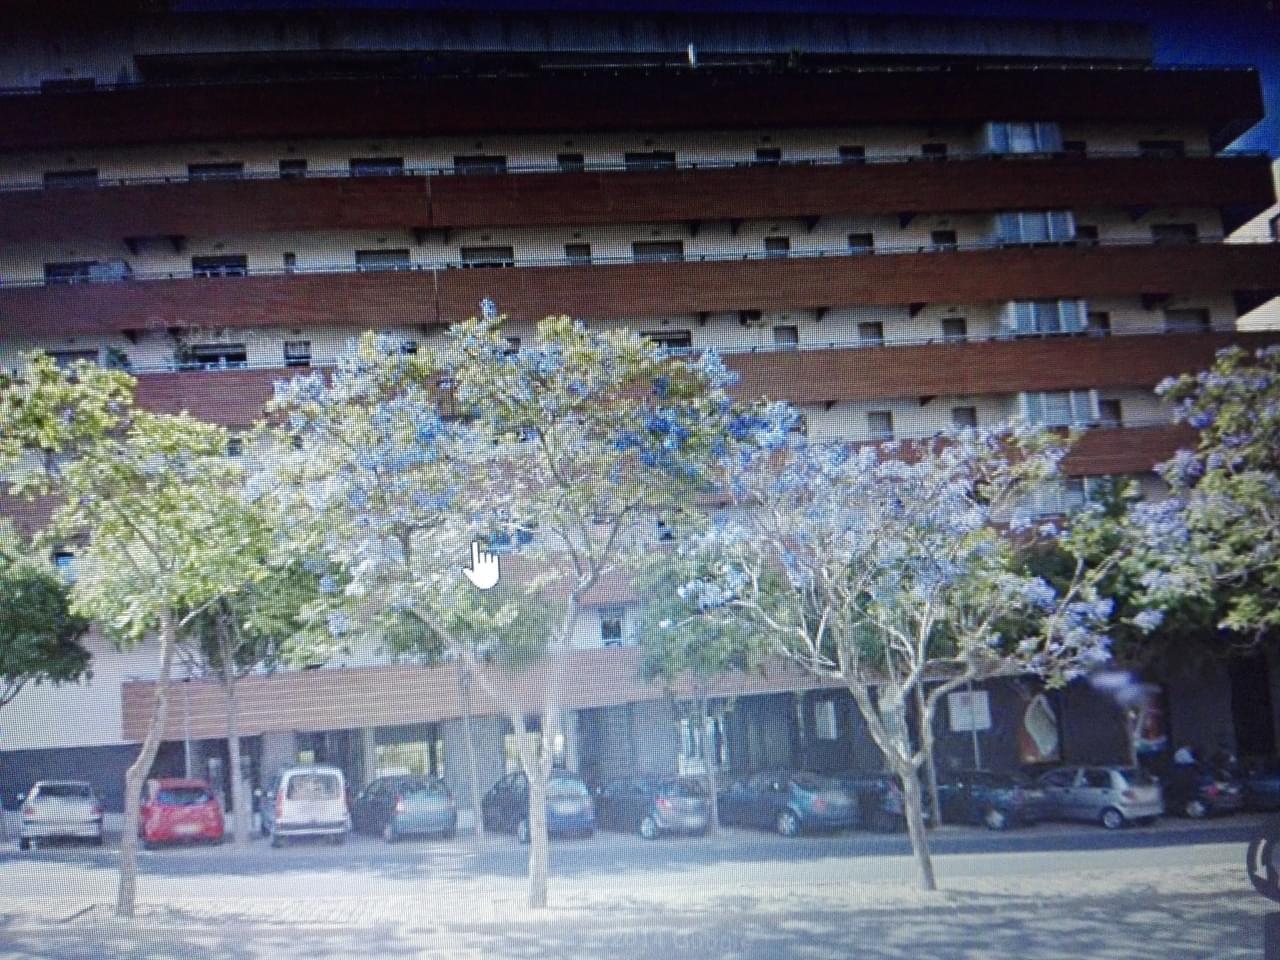 pf18814-apartamento-t2-lisboa-82ccdda2-6d4b-4843-ac3c-e7a7c361b4cc